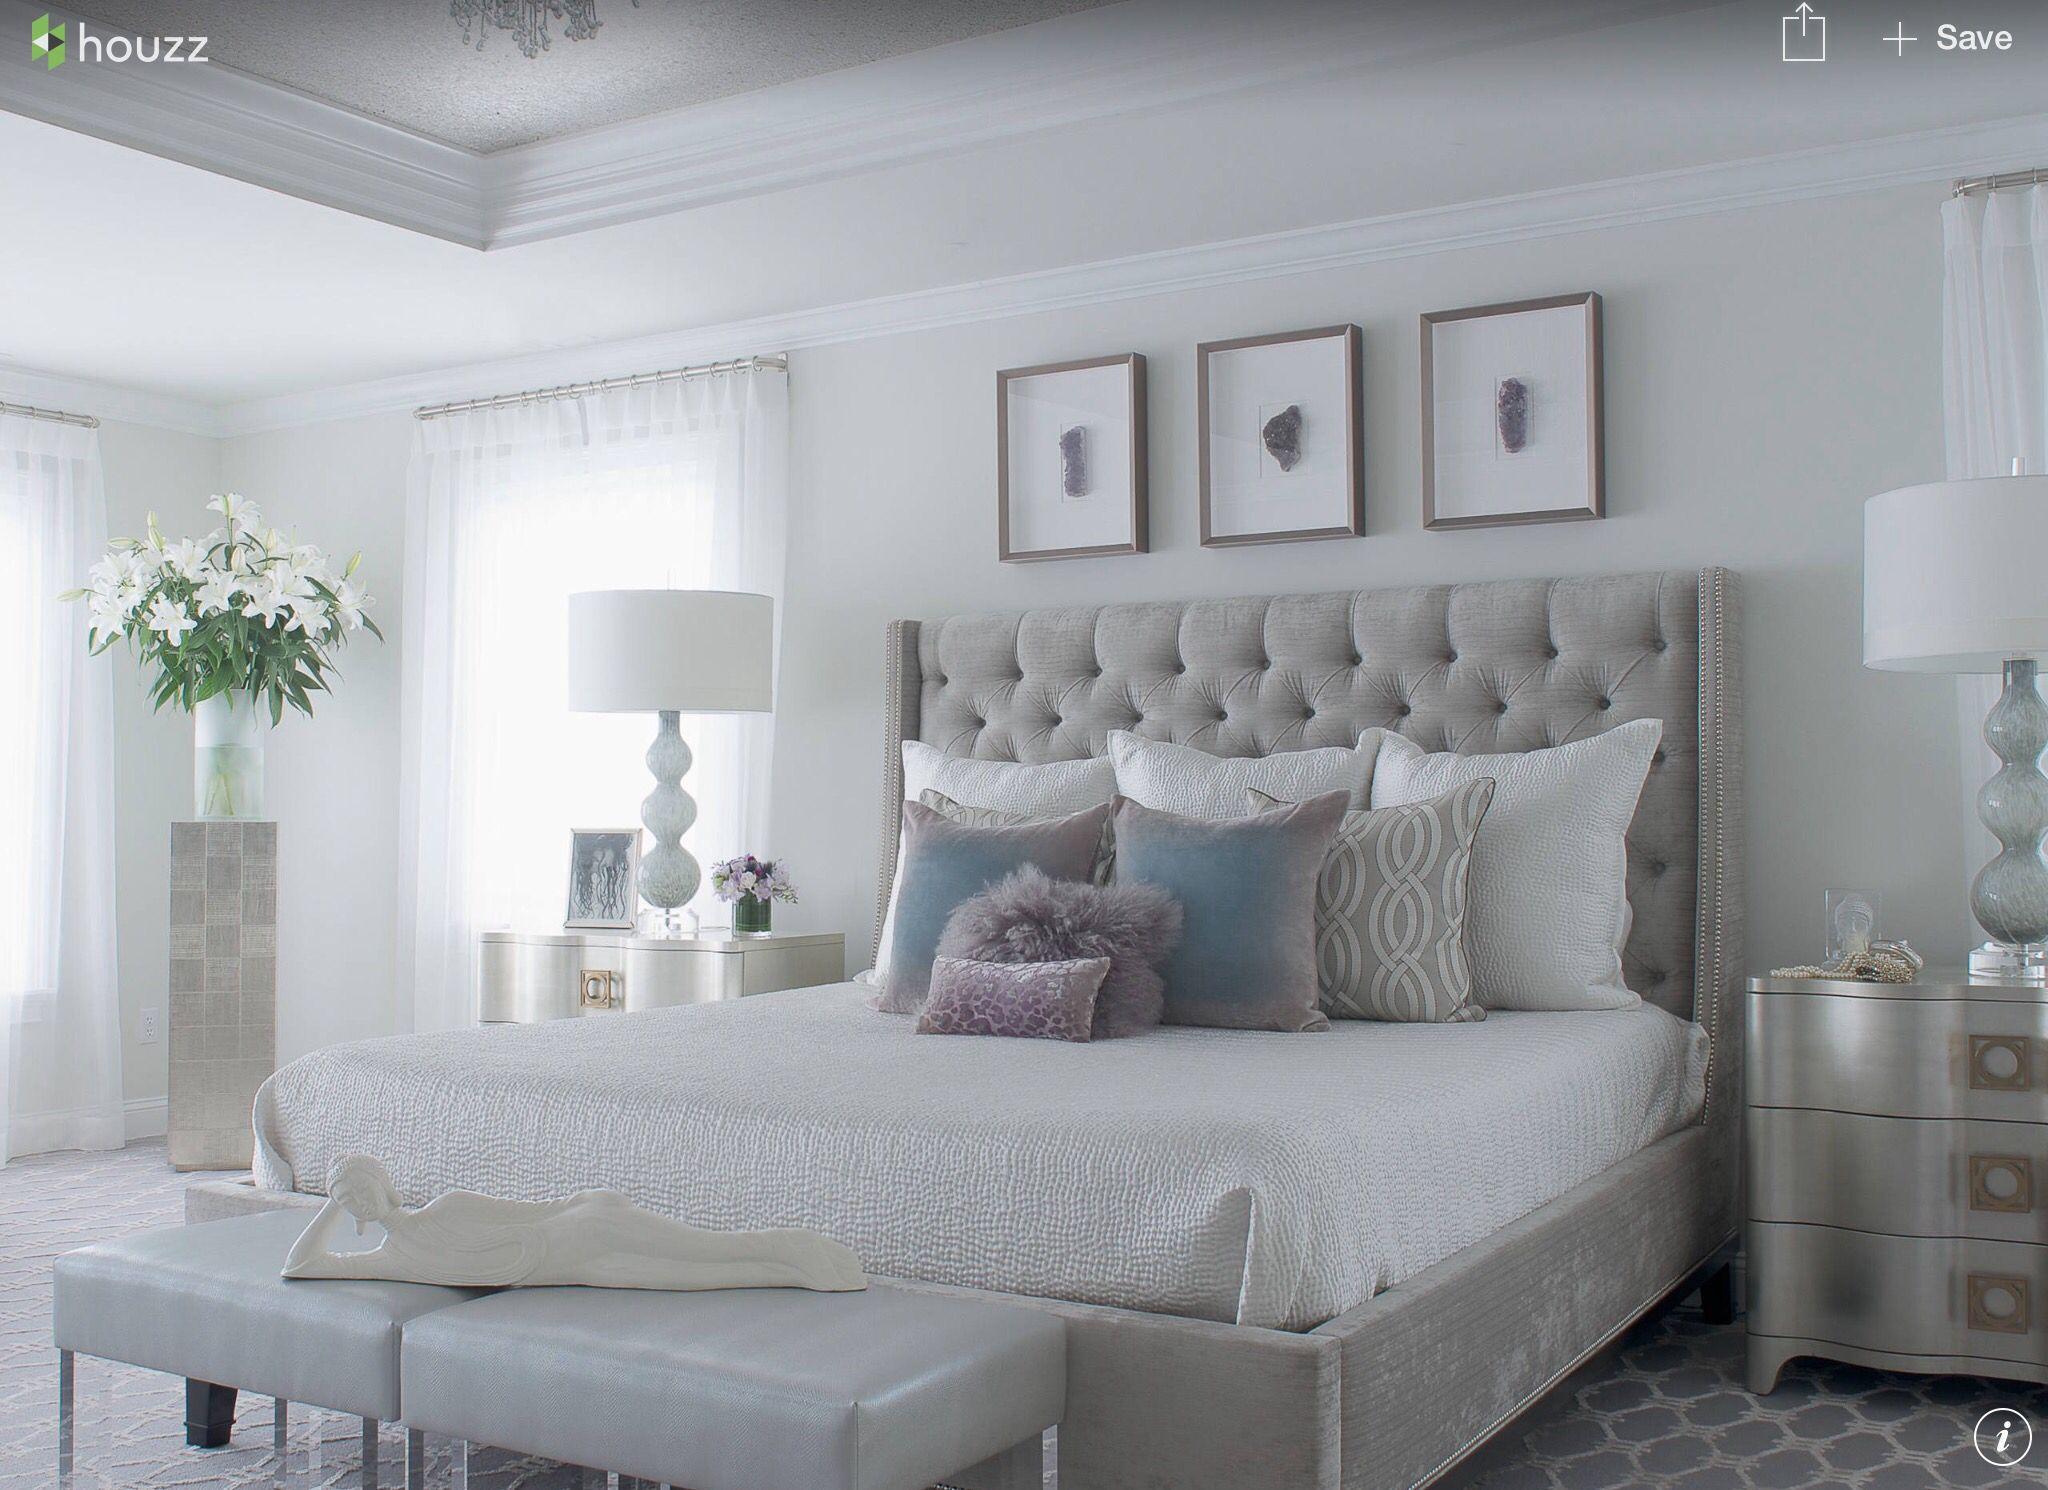 Small Master Bedroom Ideas Houzz Trends 2020 Bedroom Design Couples Master Bedroom Small Master Bedroom